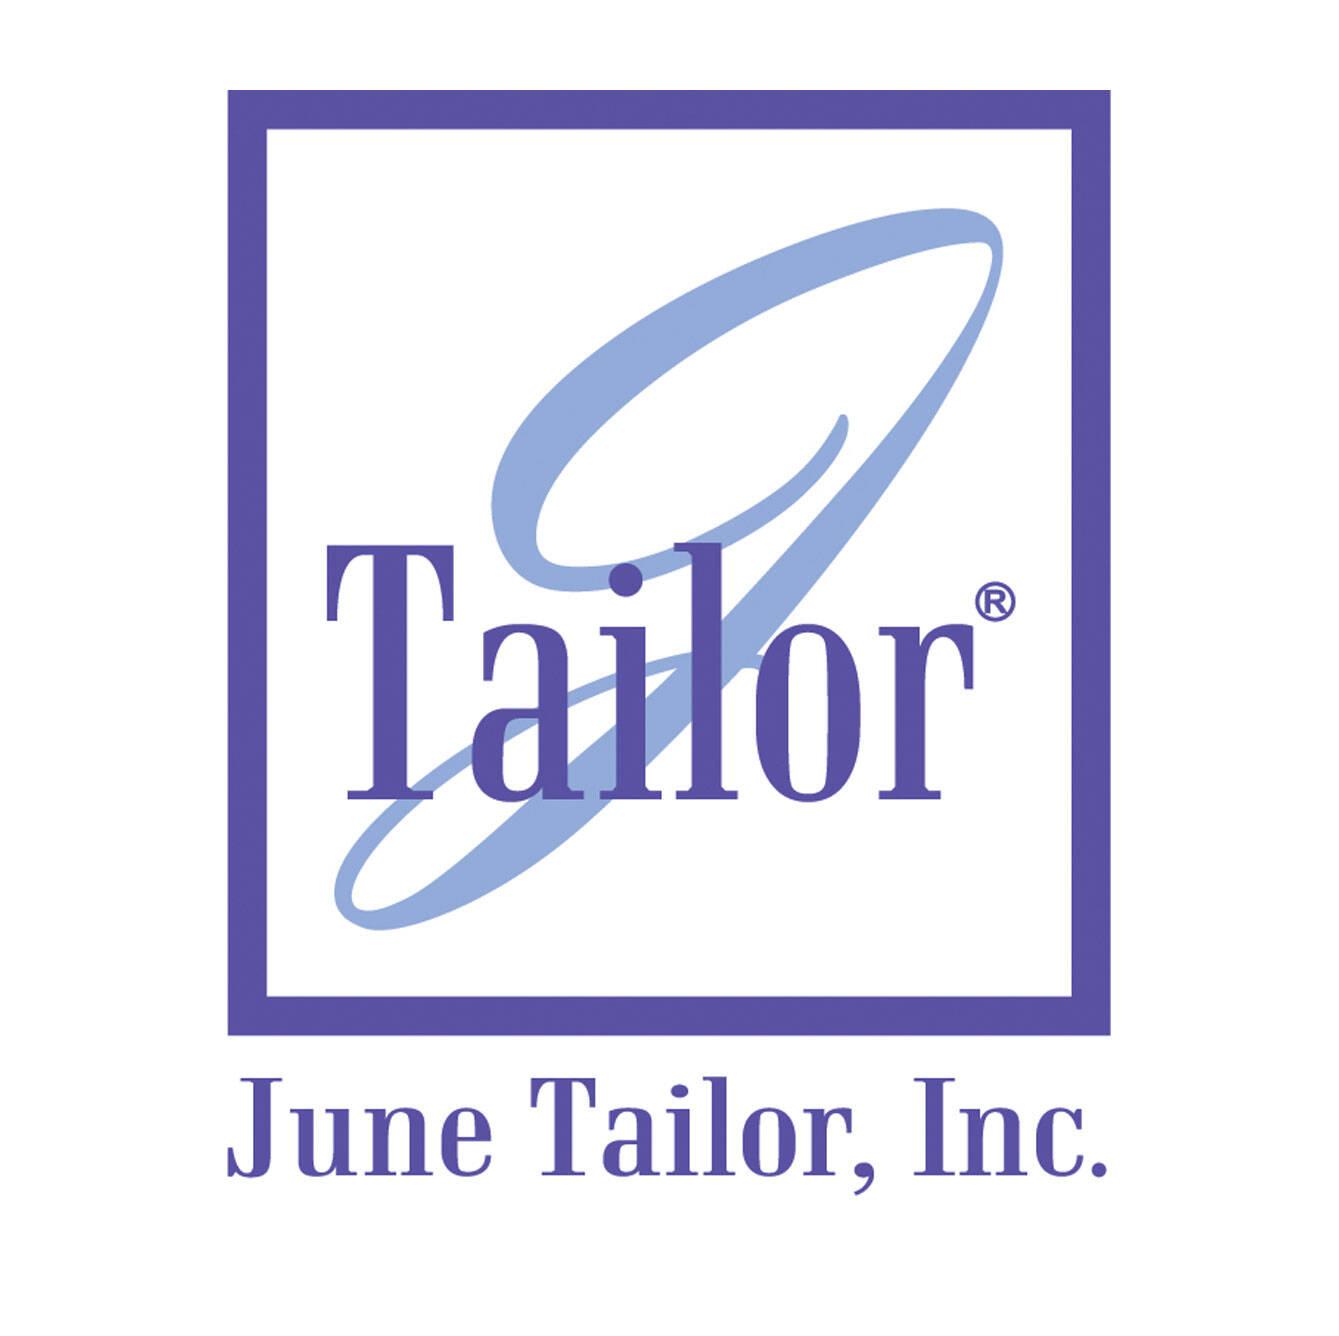 June Tailor